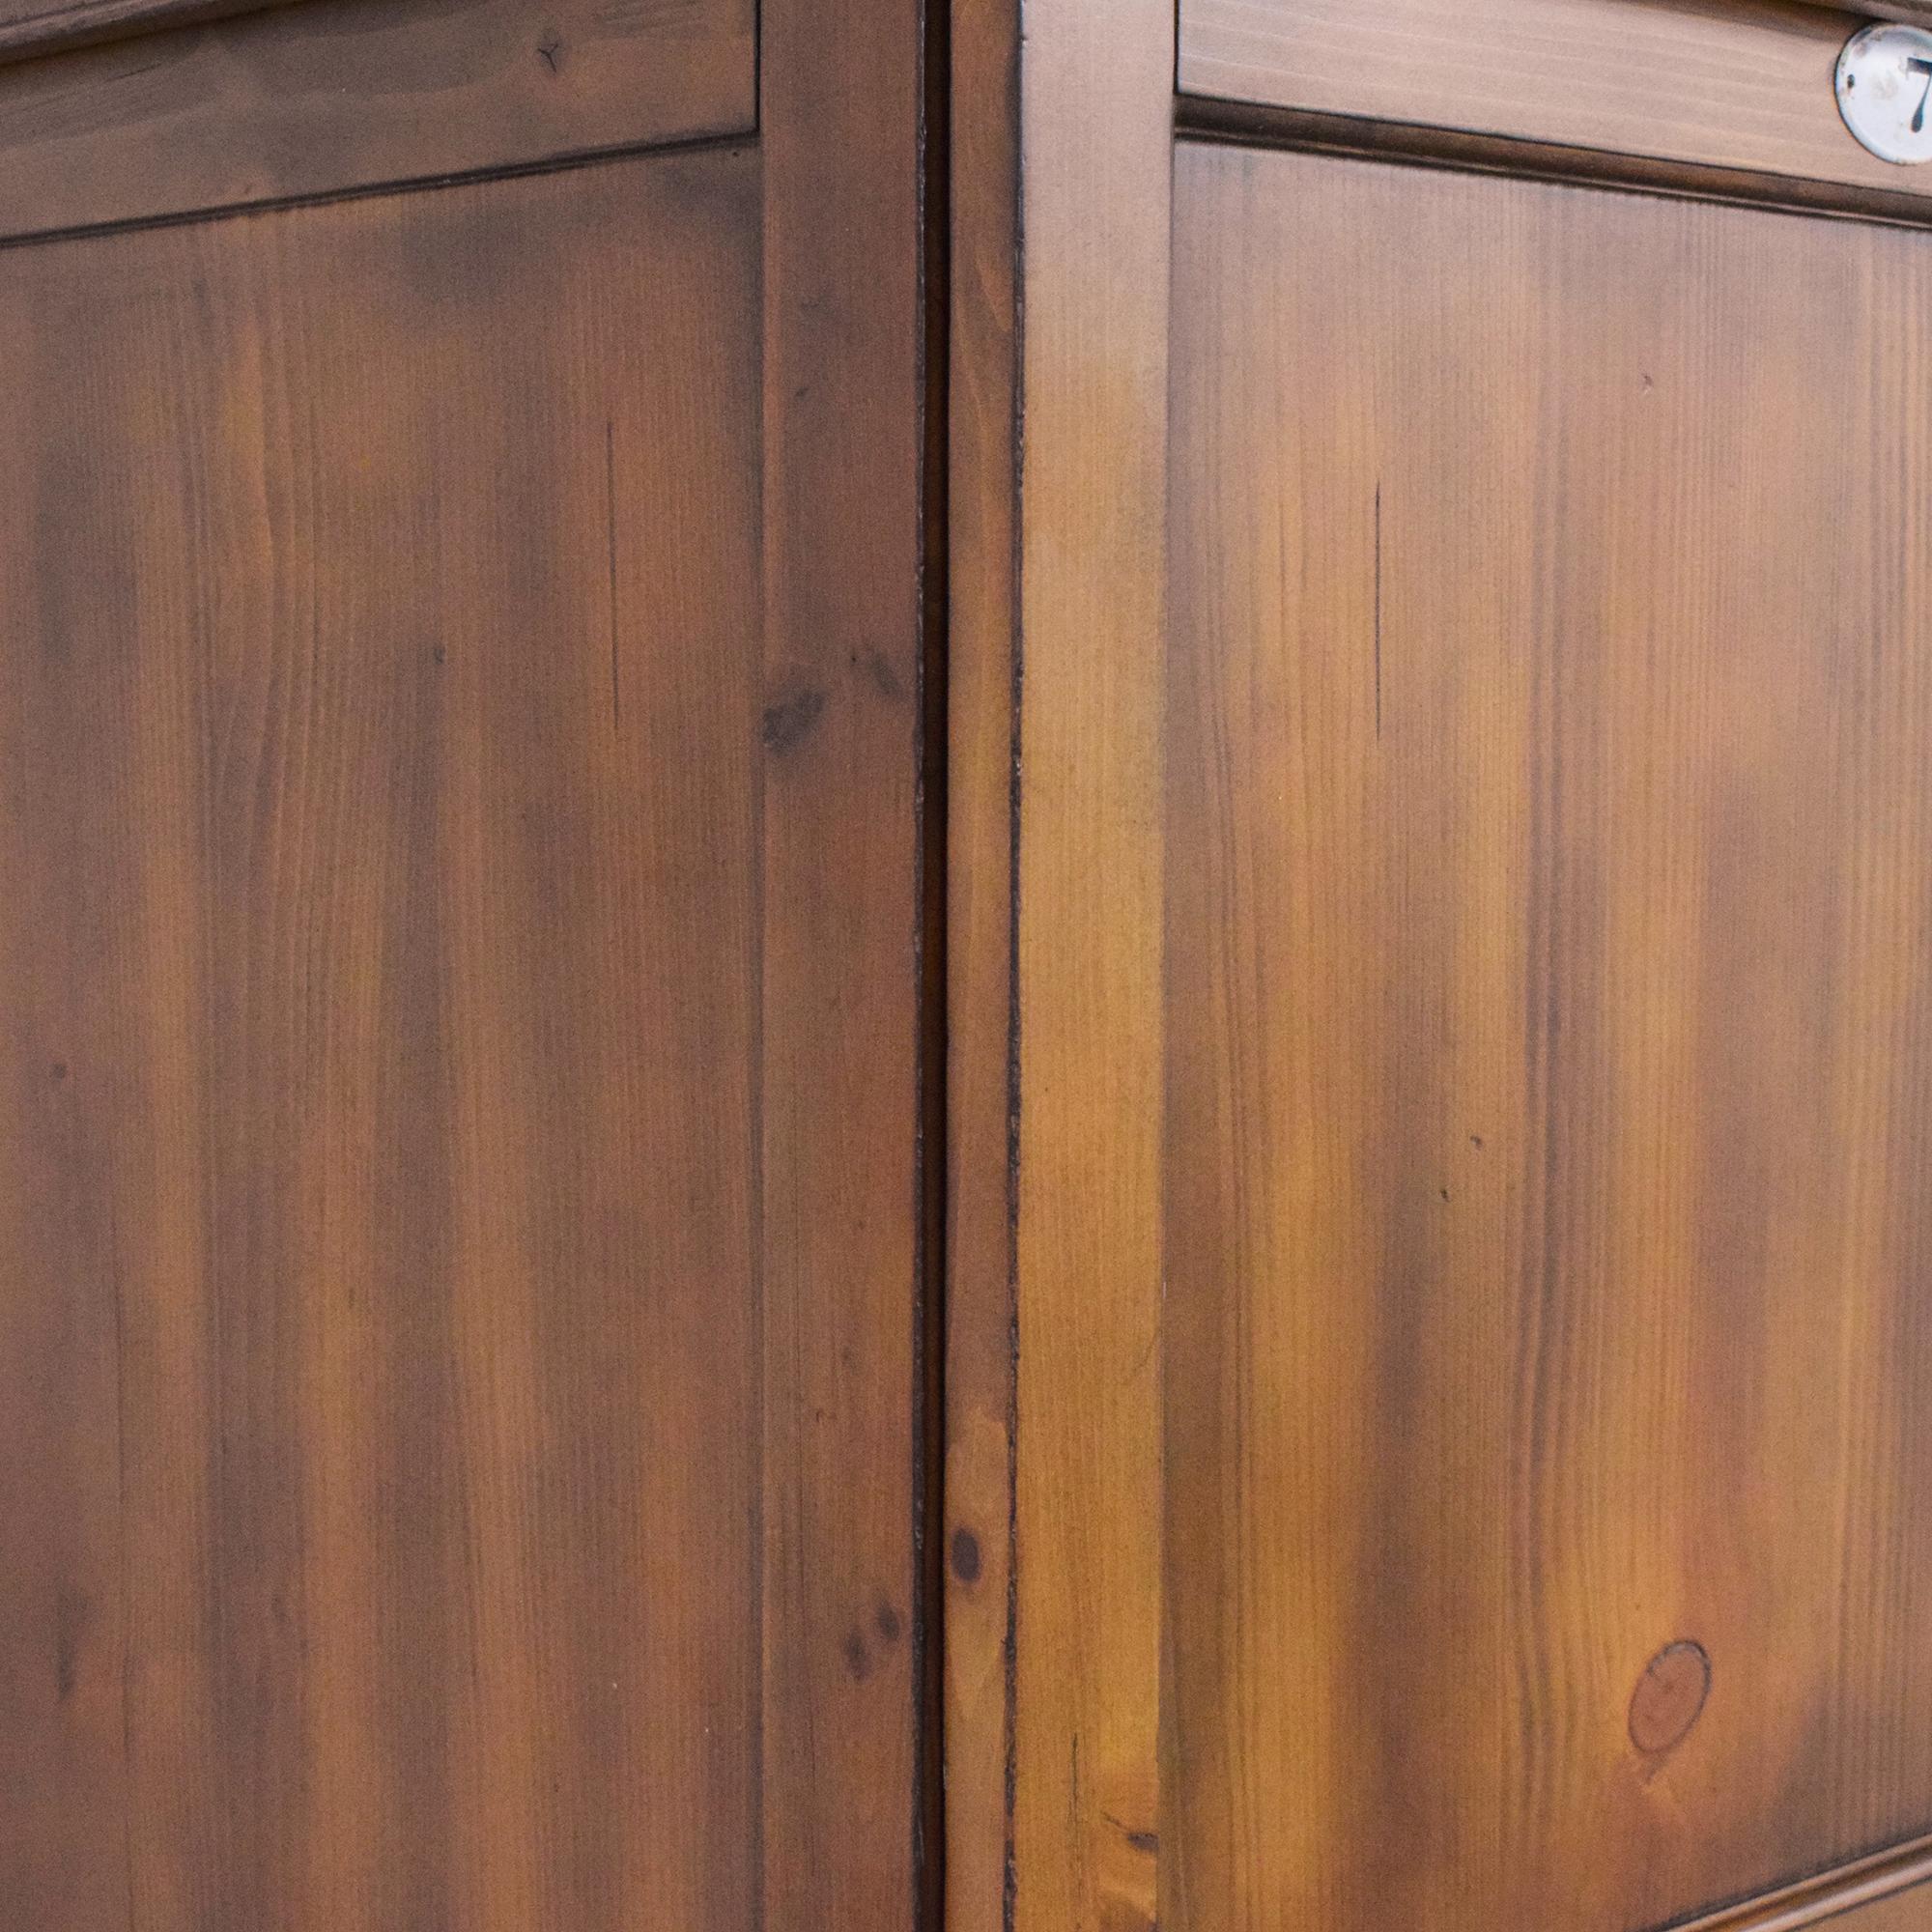 Pottery Barn Dayton French Locker Media Armoire with Sliding Doors sale